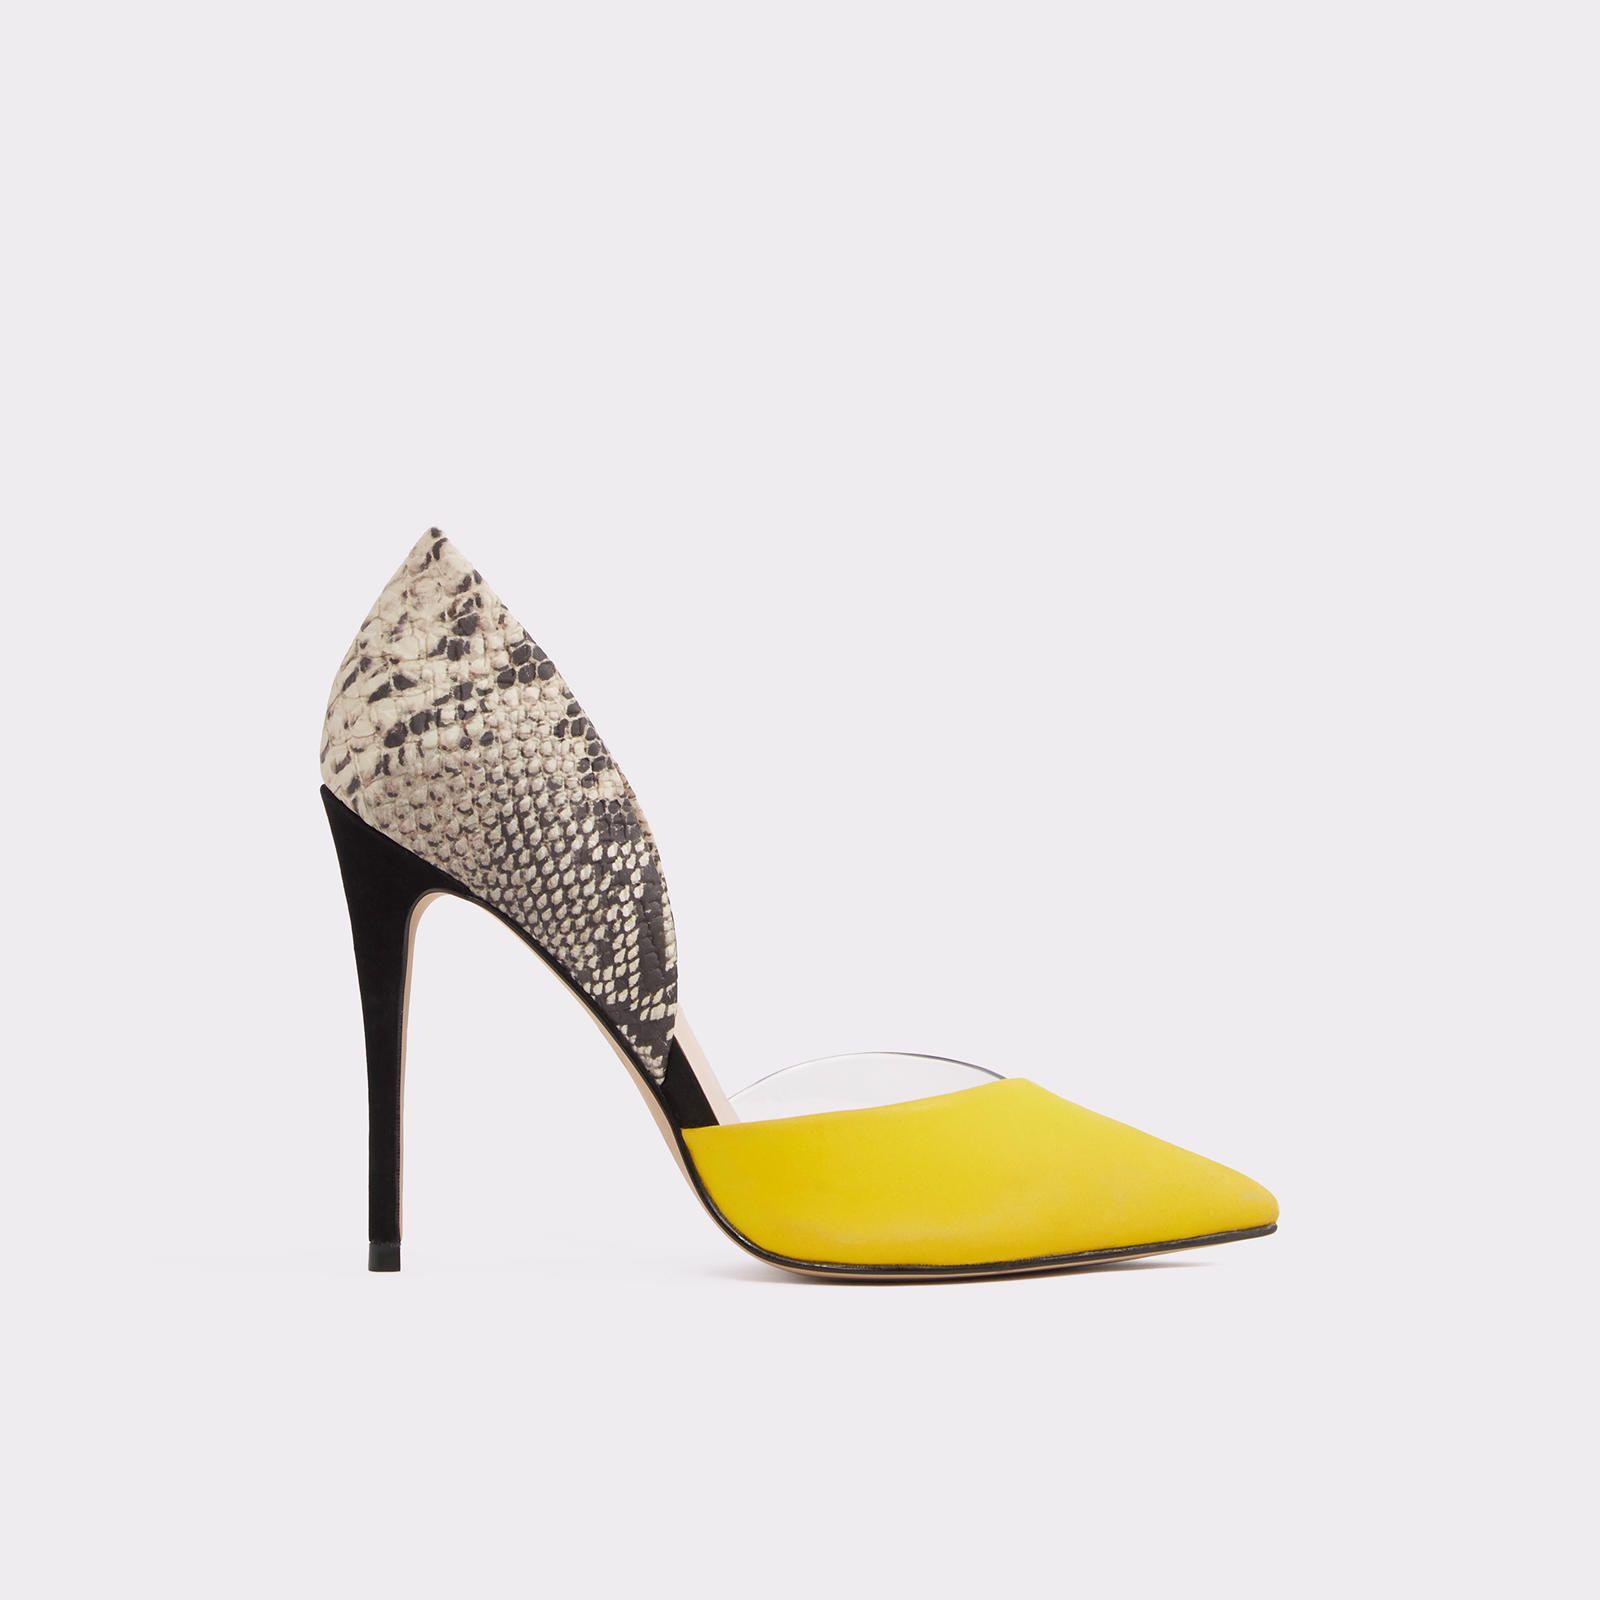 9f2b25842e Legiralia / Aldo Aldo Heels, High Heels Stilettos, Stiletto Heels, Women's  Pumps,